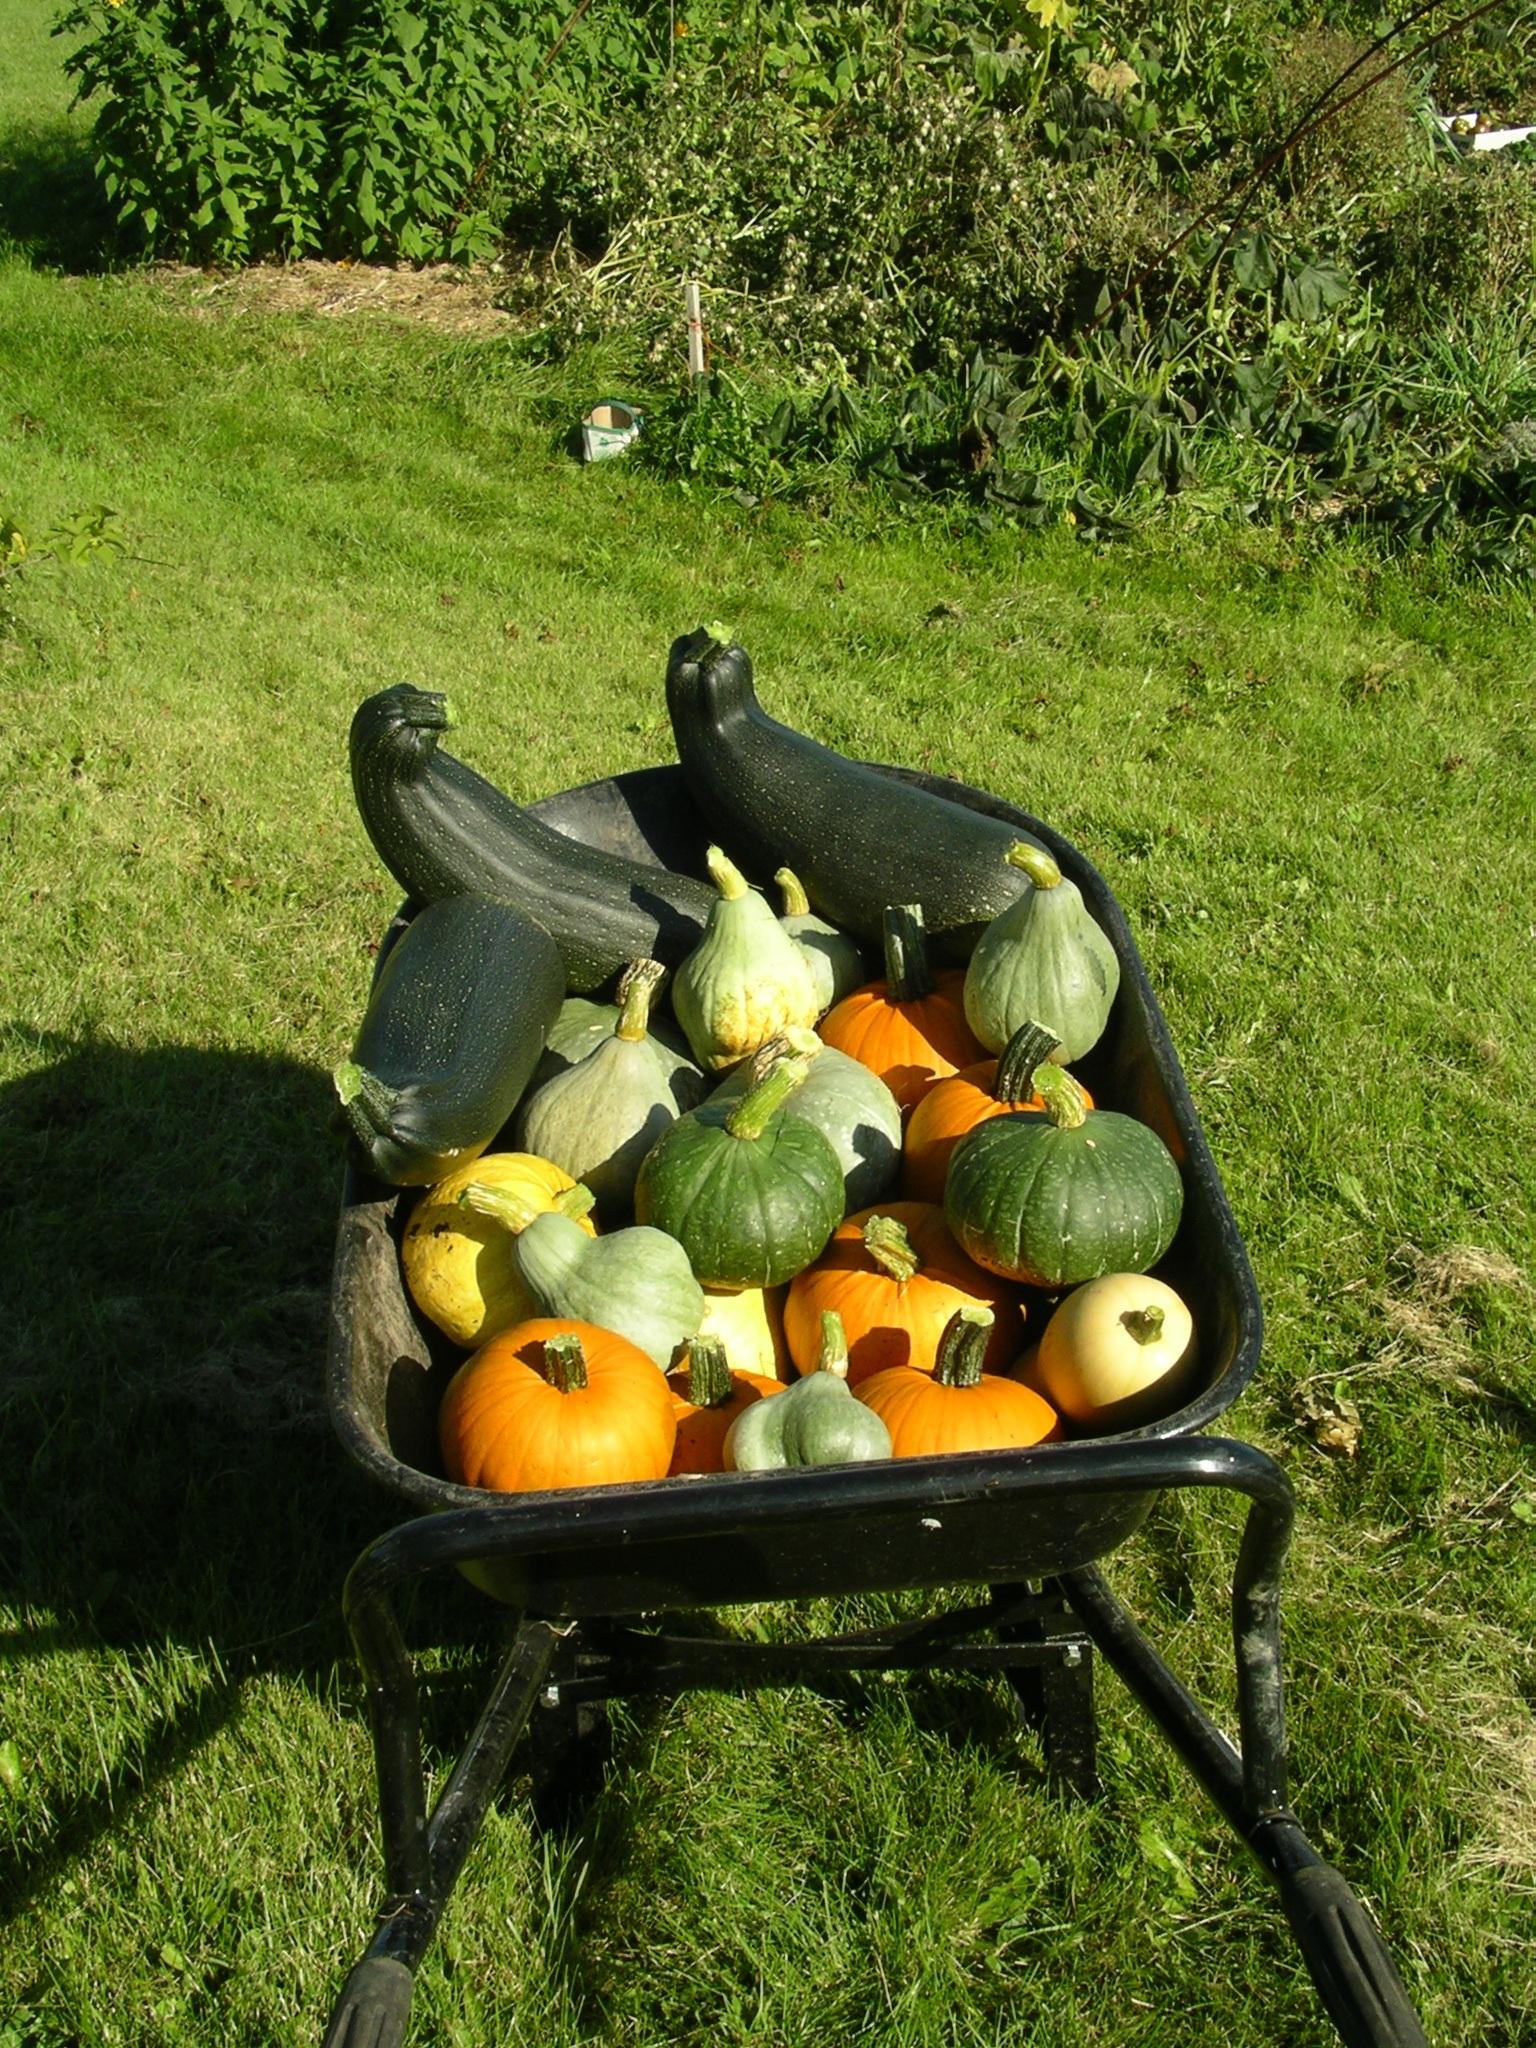 Stéphane's vegetables